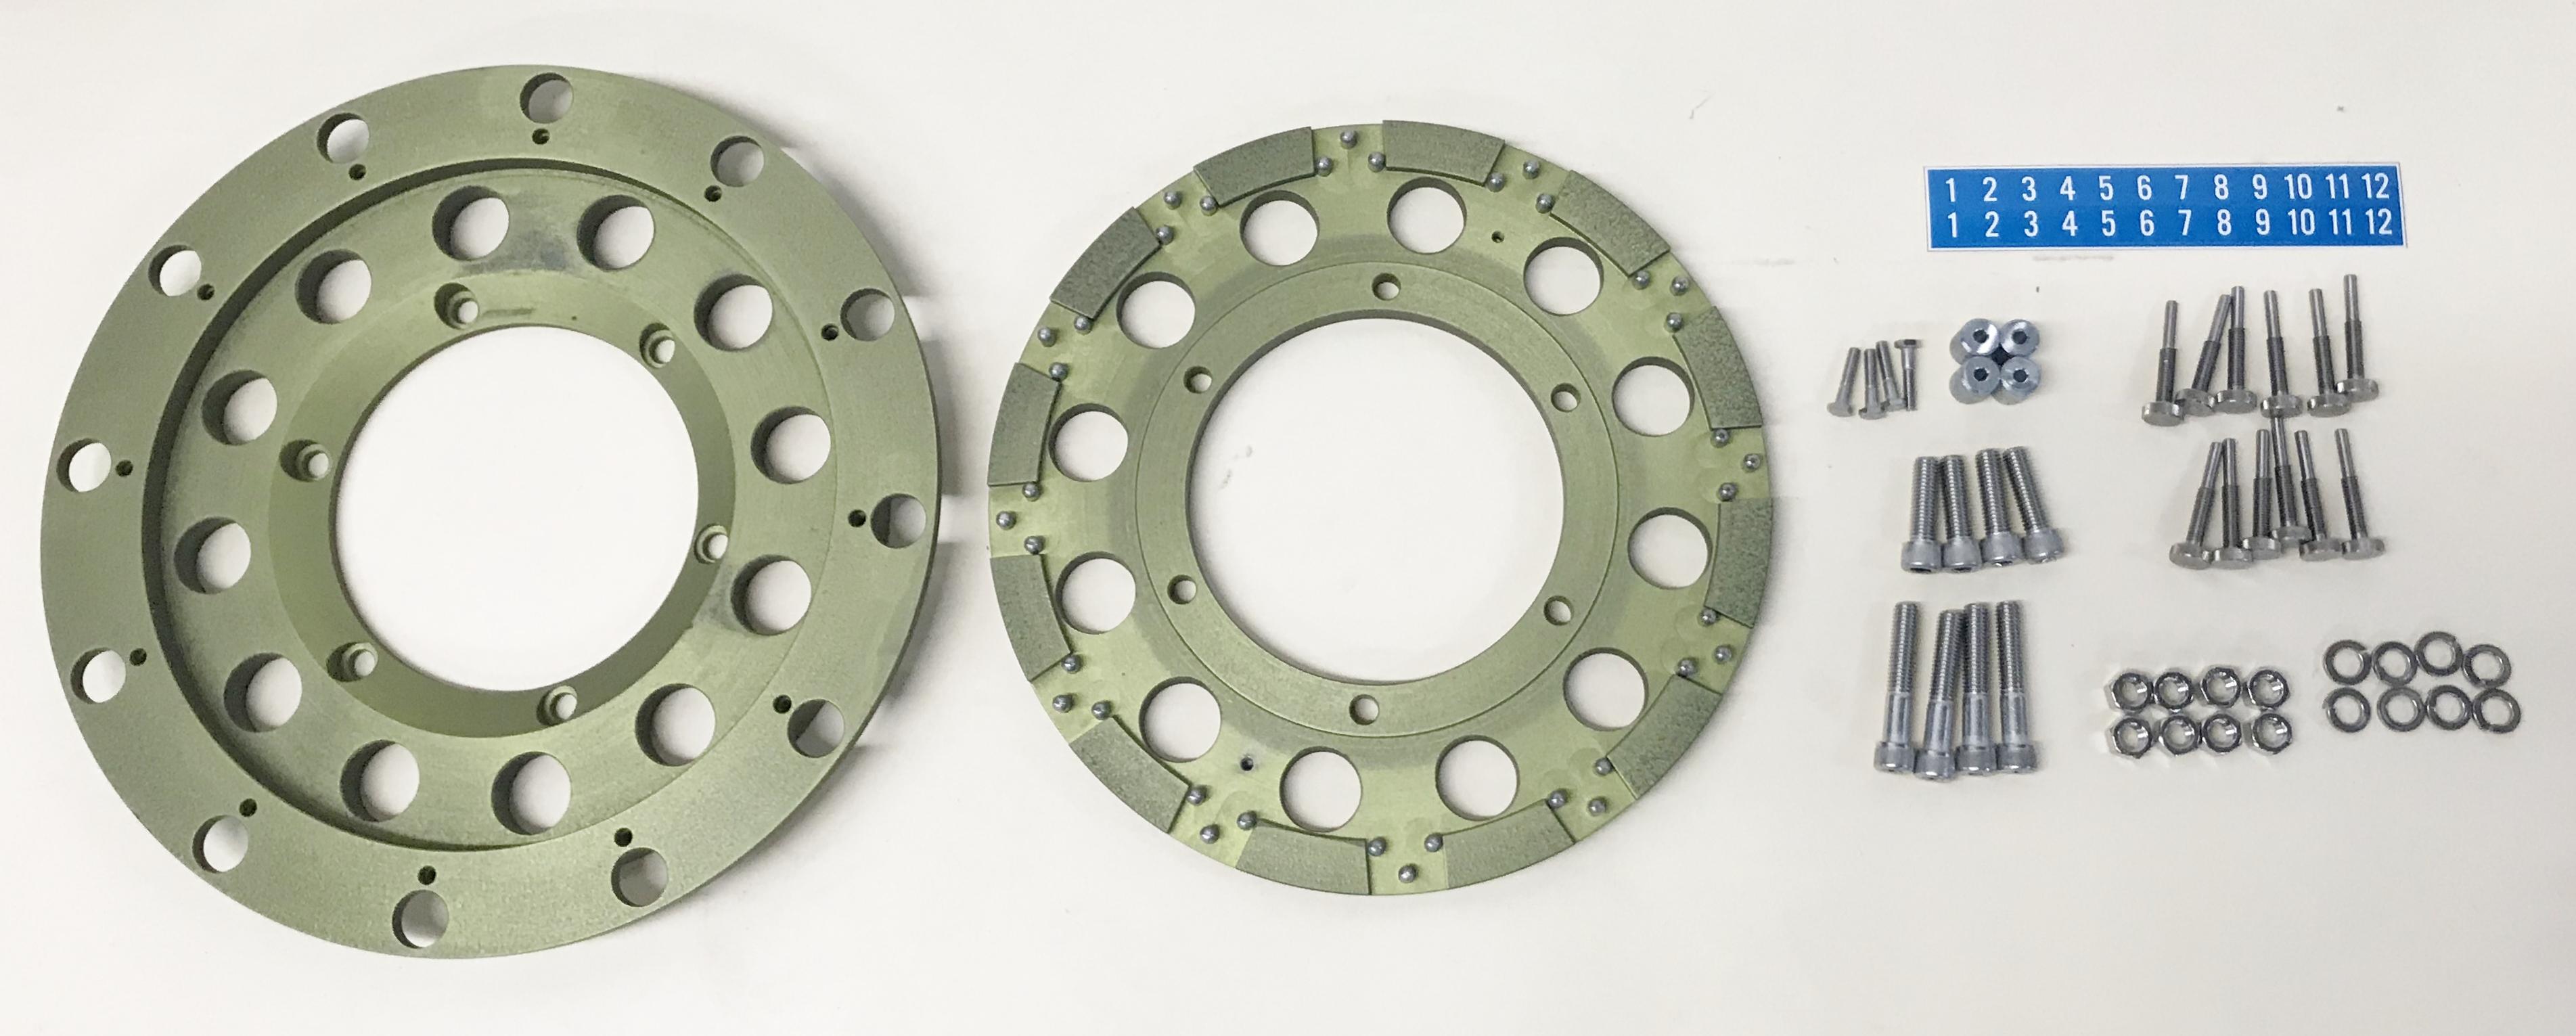 Adaptor Plates 5 L-12 Liter 12 Pos